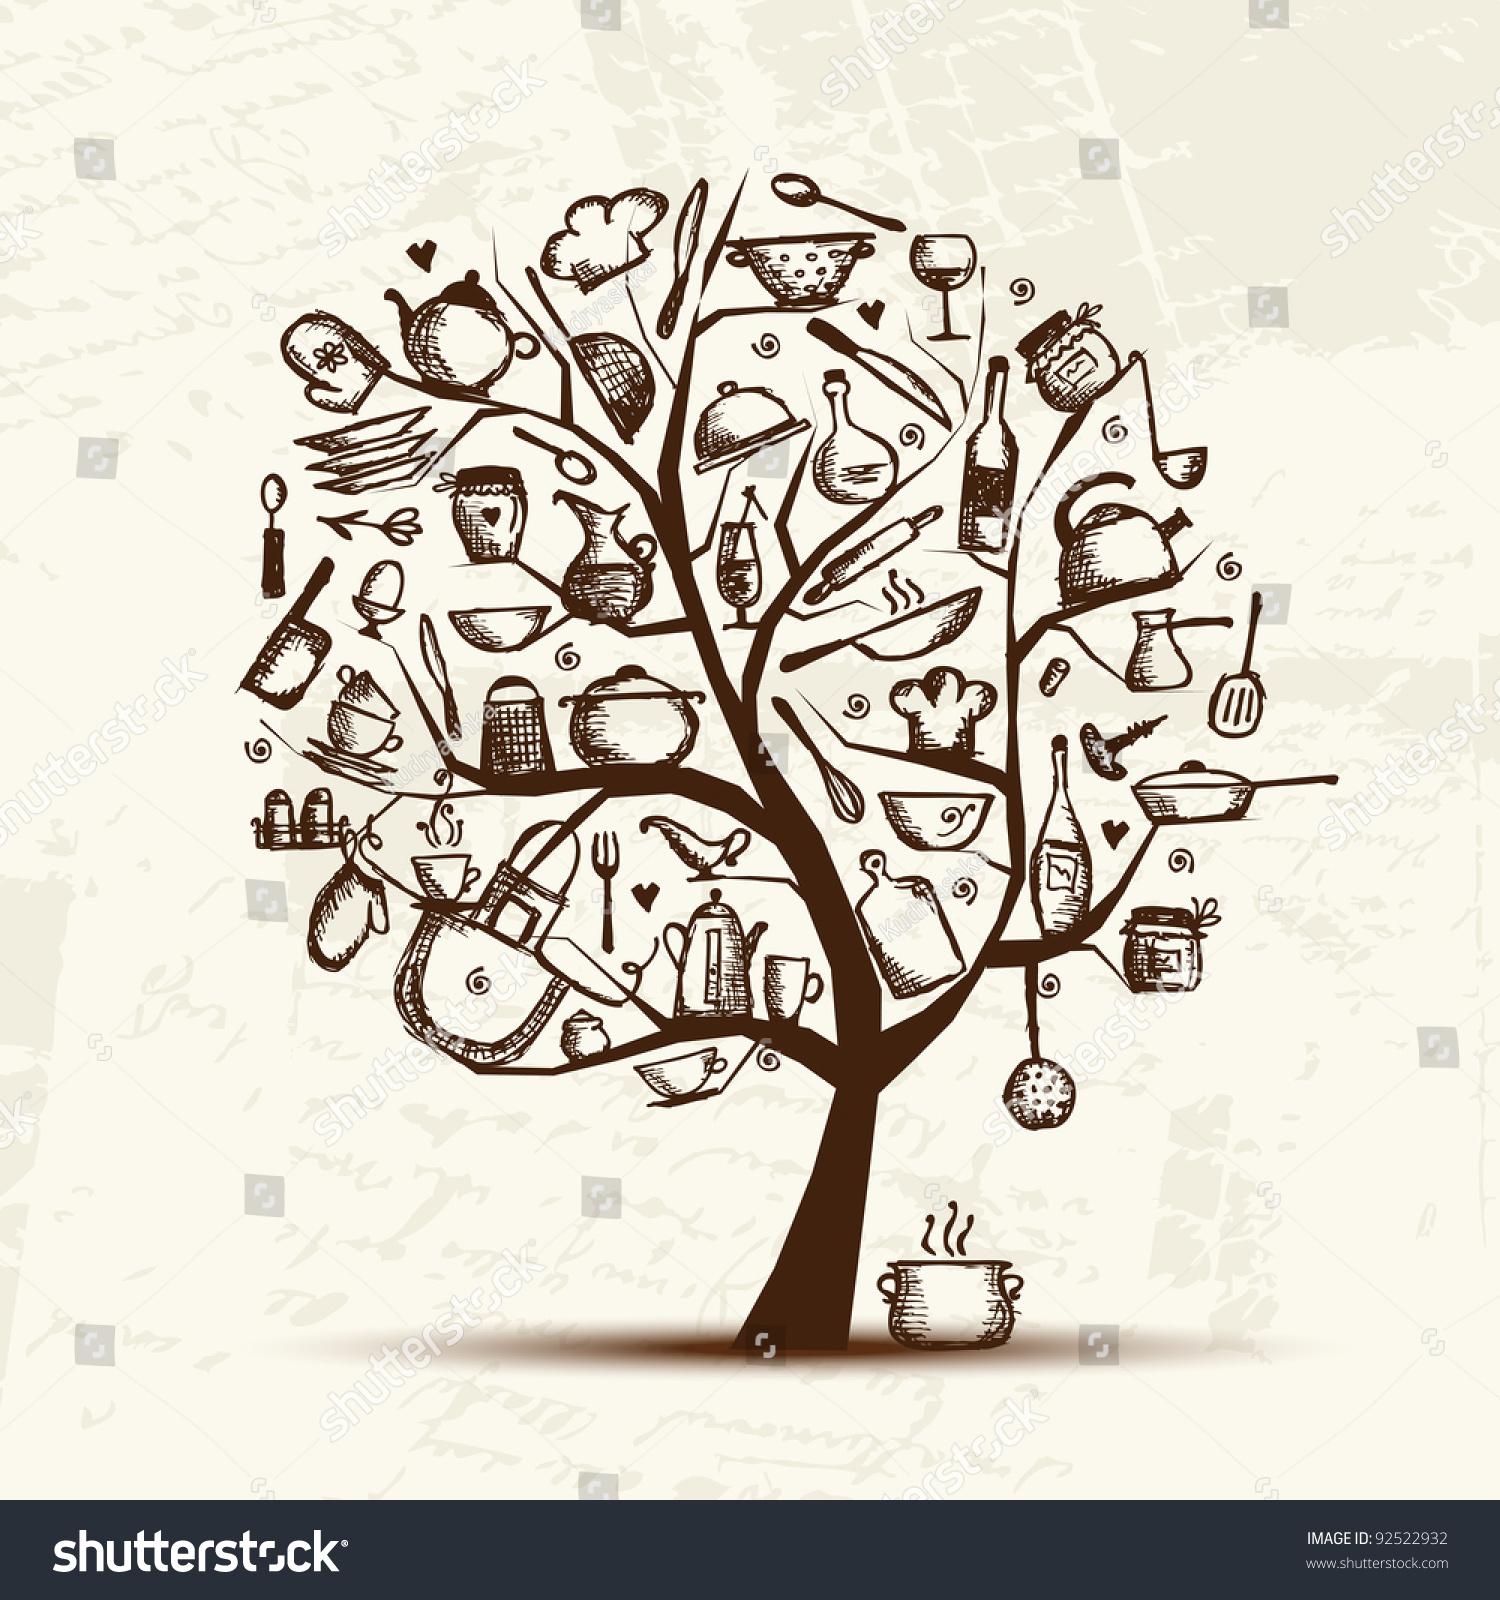 Kitchen Utensils Art art tree kitchen utensils sketch drawing stock vector 92522932